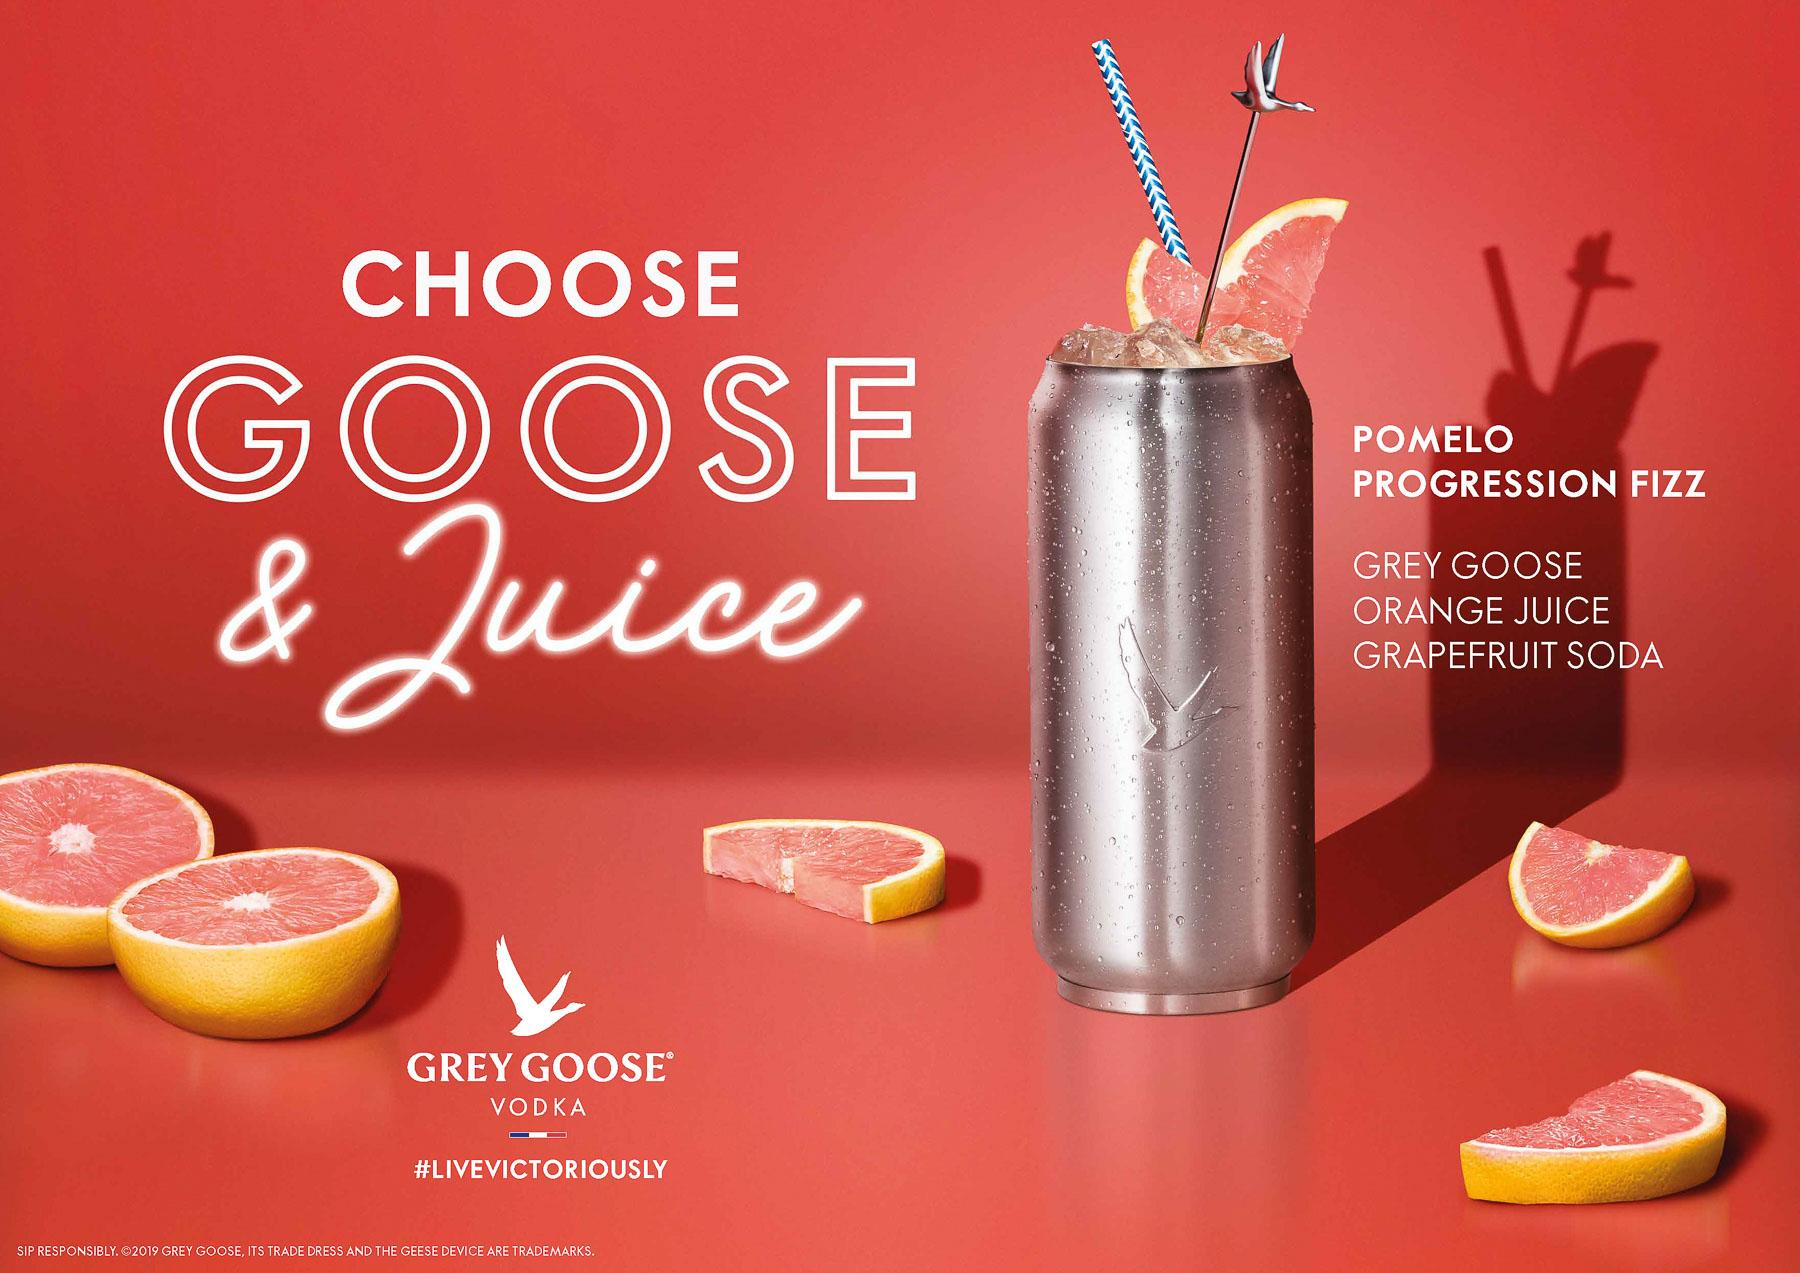 F21 Grey Goose KV Landscape Pomelo Progression Fizz Goose Juice